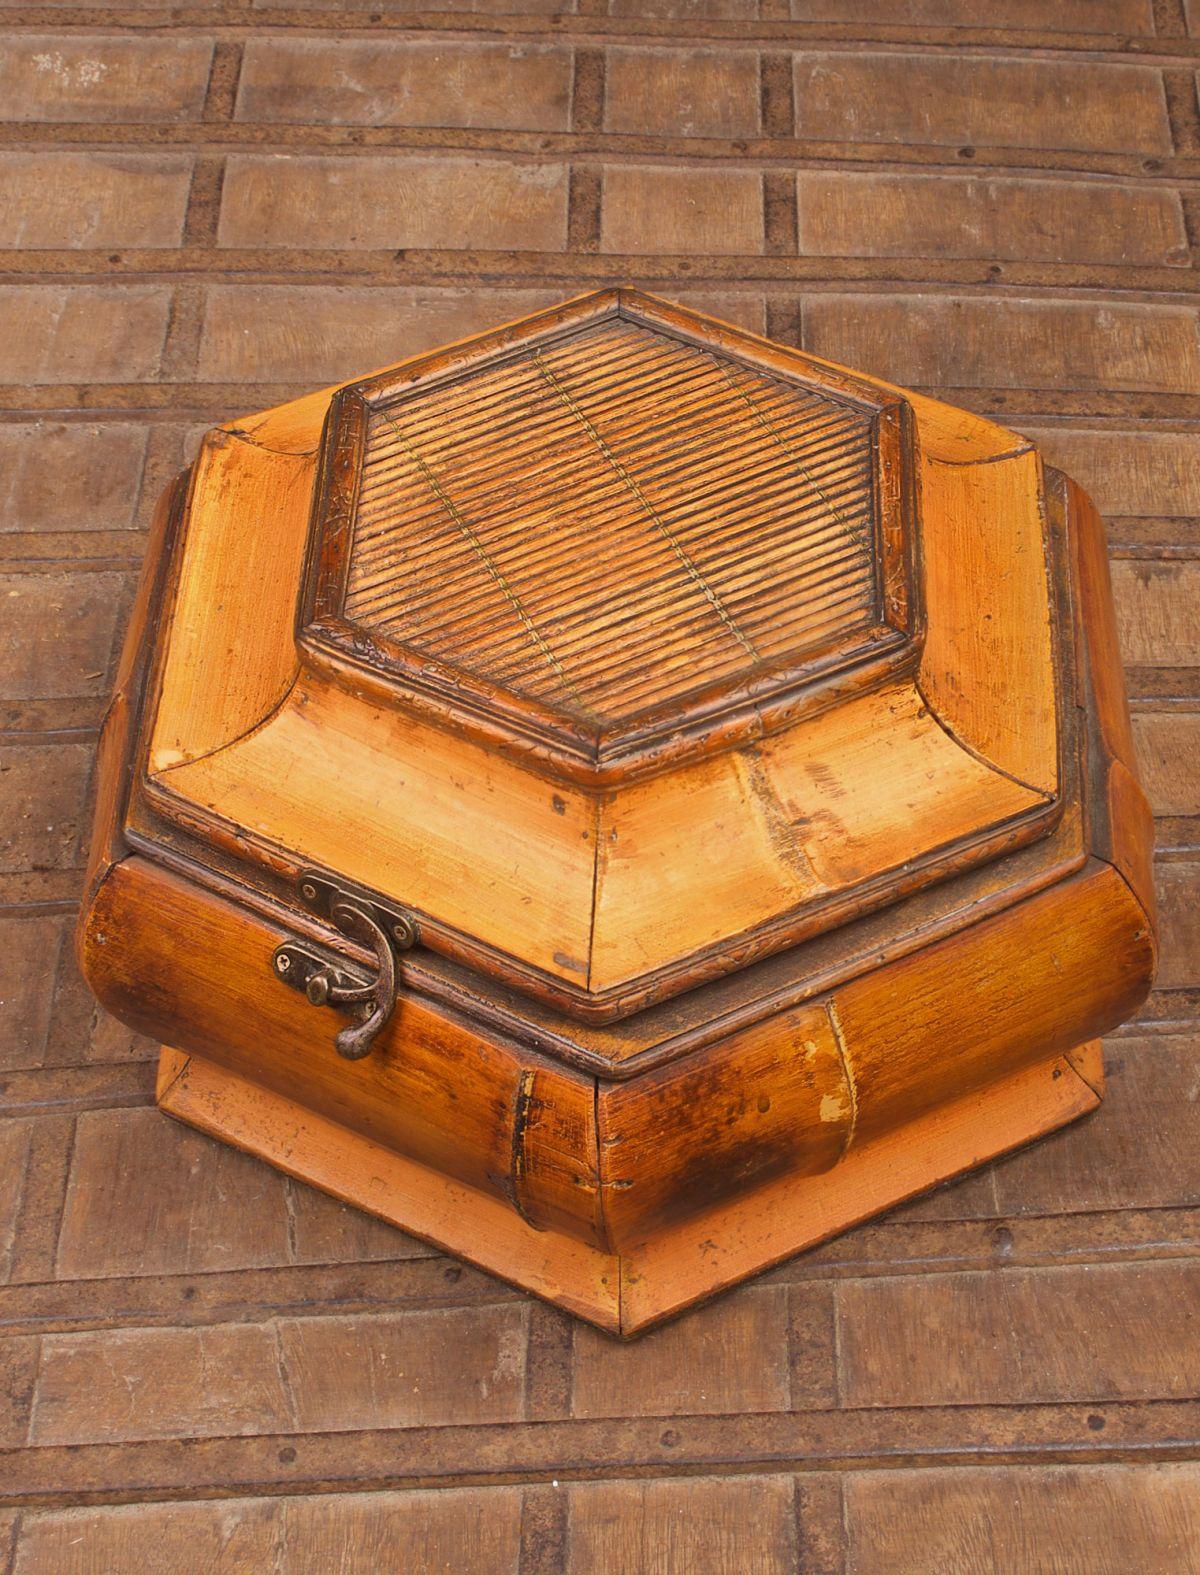 VINTAGE JAPANESE LACQUERED BAMBOO KEEPSAKE BOX